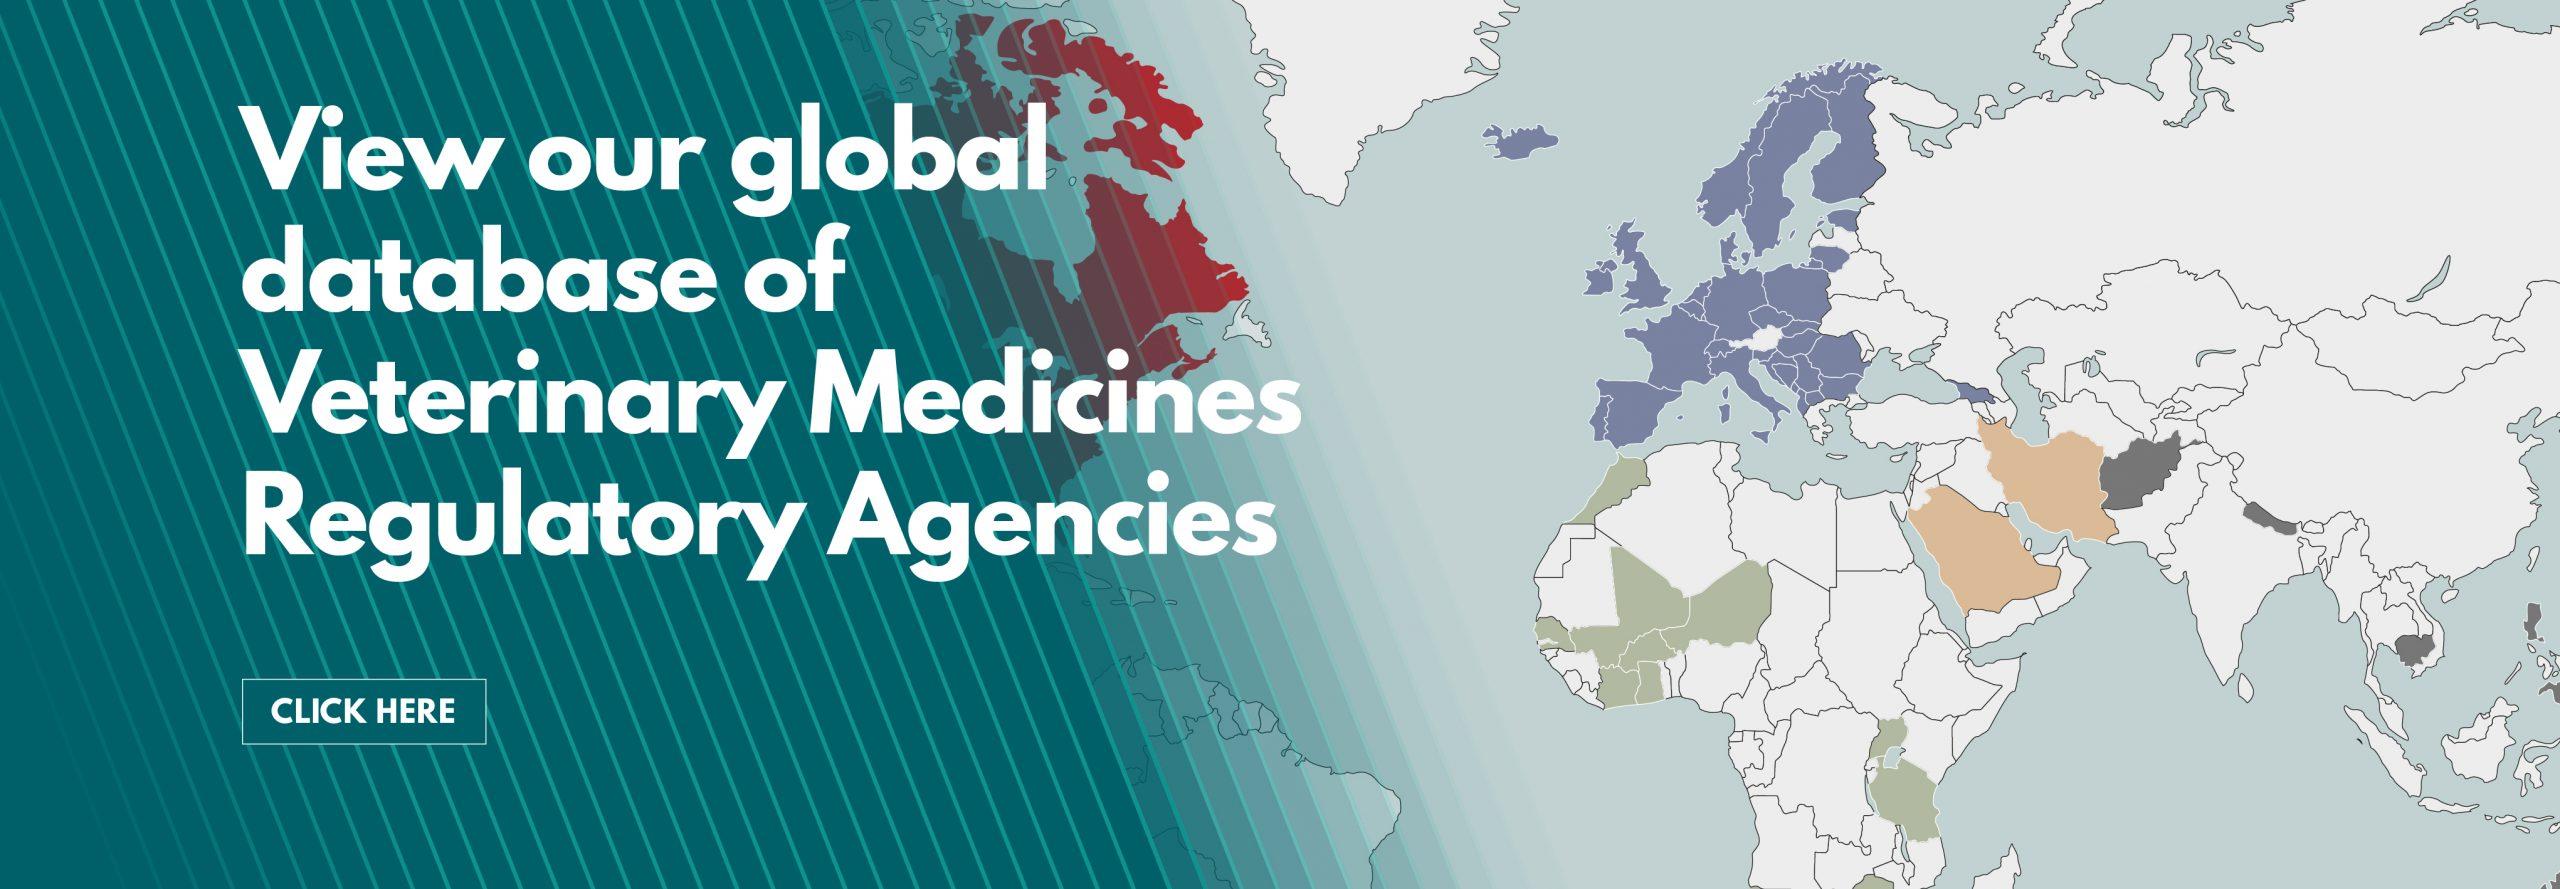 Global database of Veterinary Medicines Regulatory Agencies